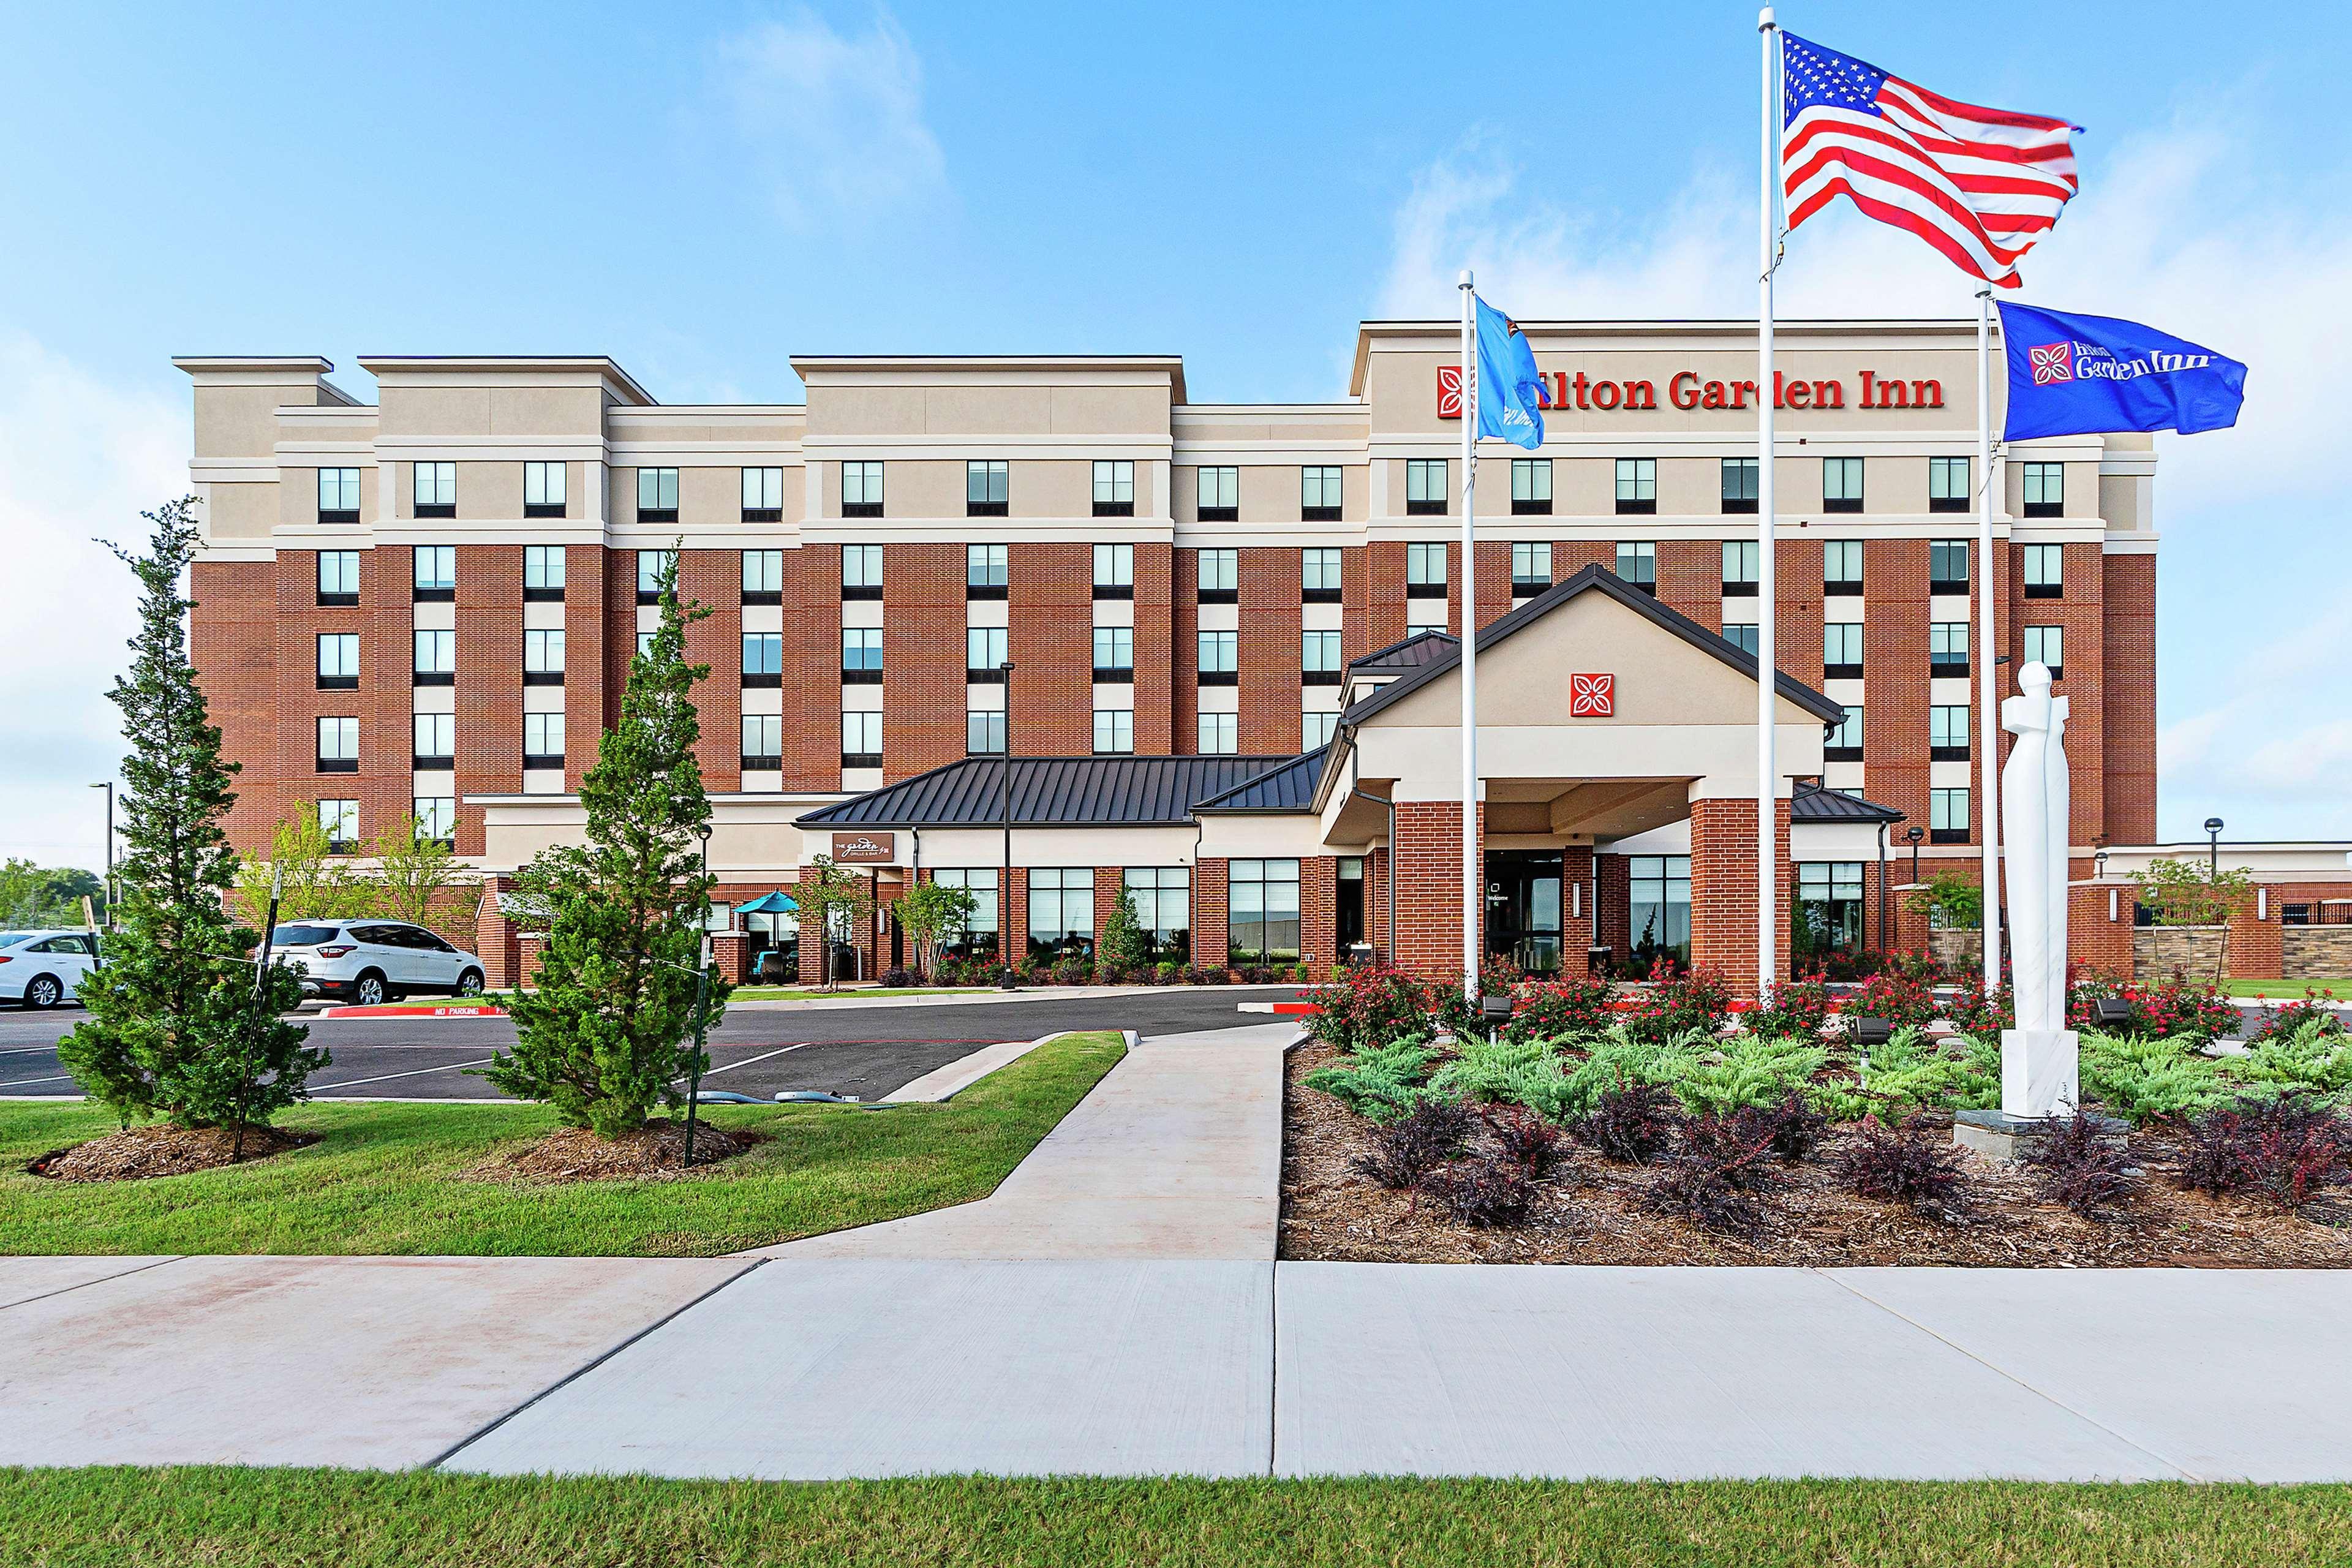 Hilton Garden Inn Edmond, OK, Oklahoma